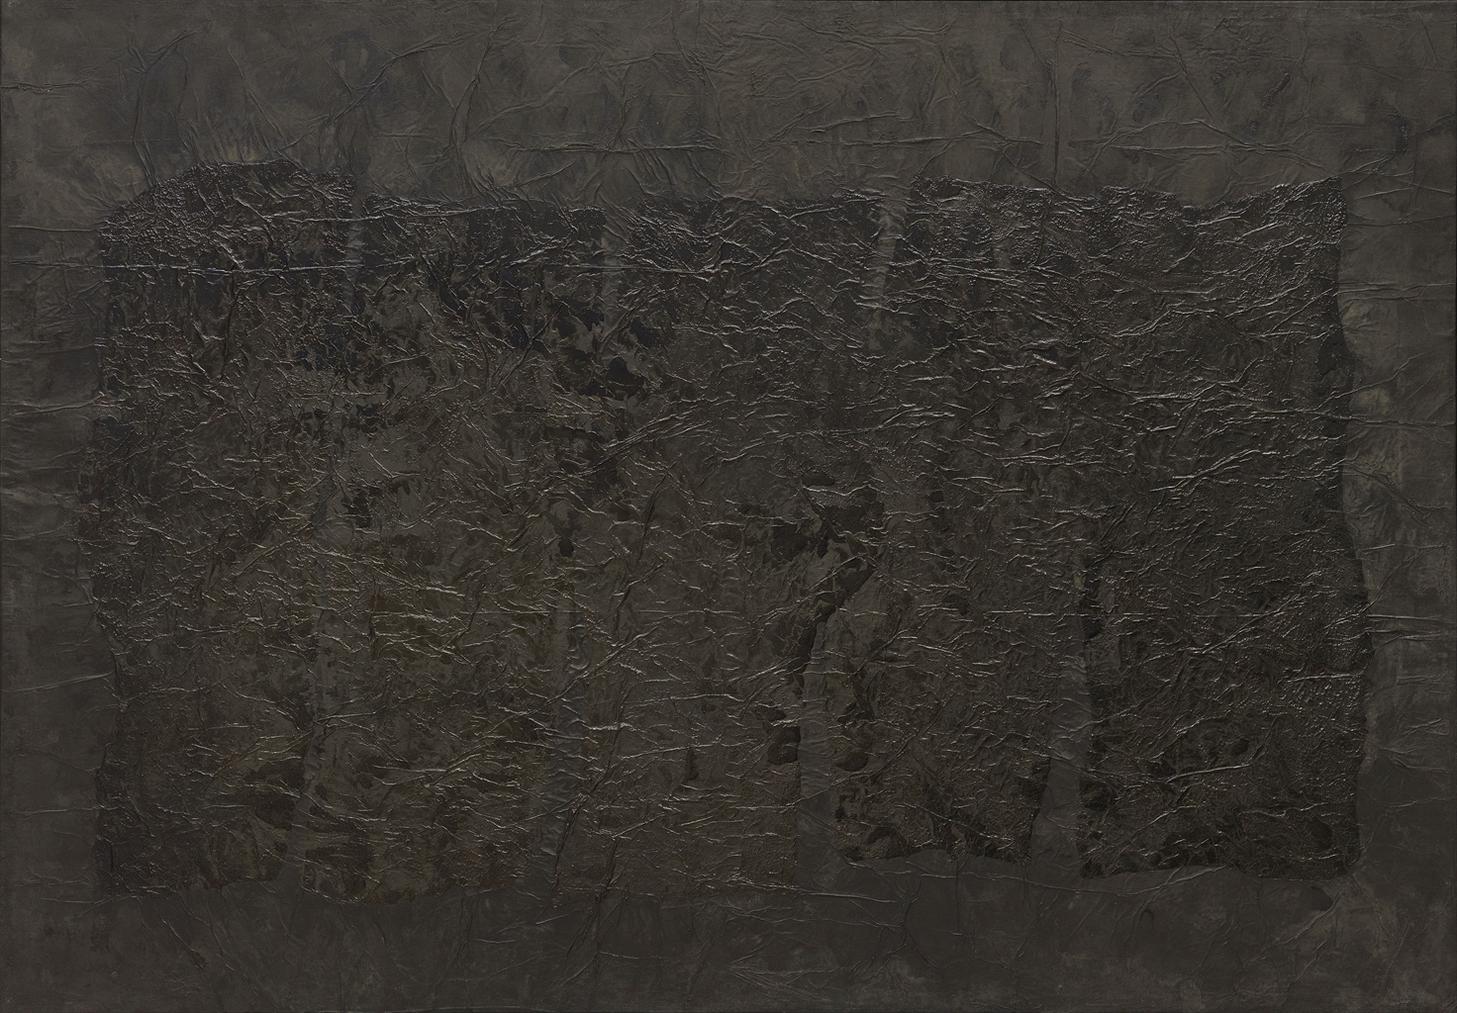 Yang Jiechang-Untitled (No. 0451994)-1994